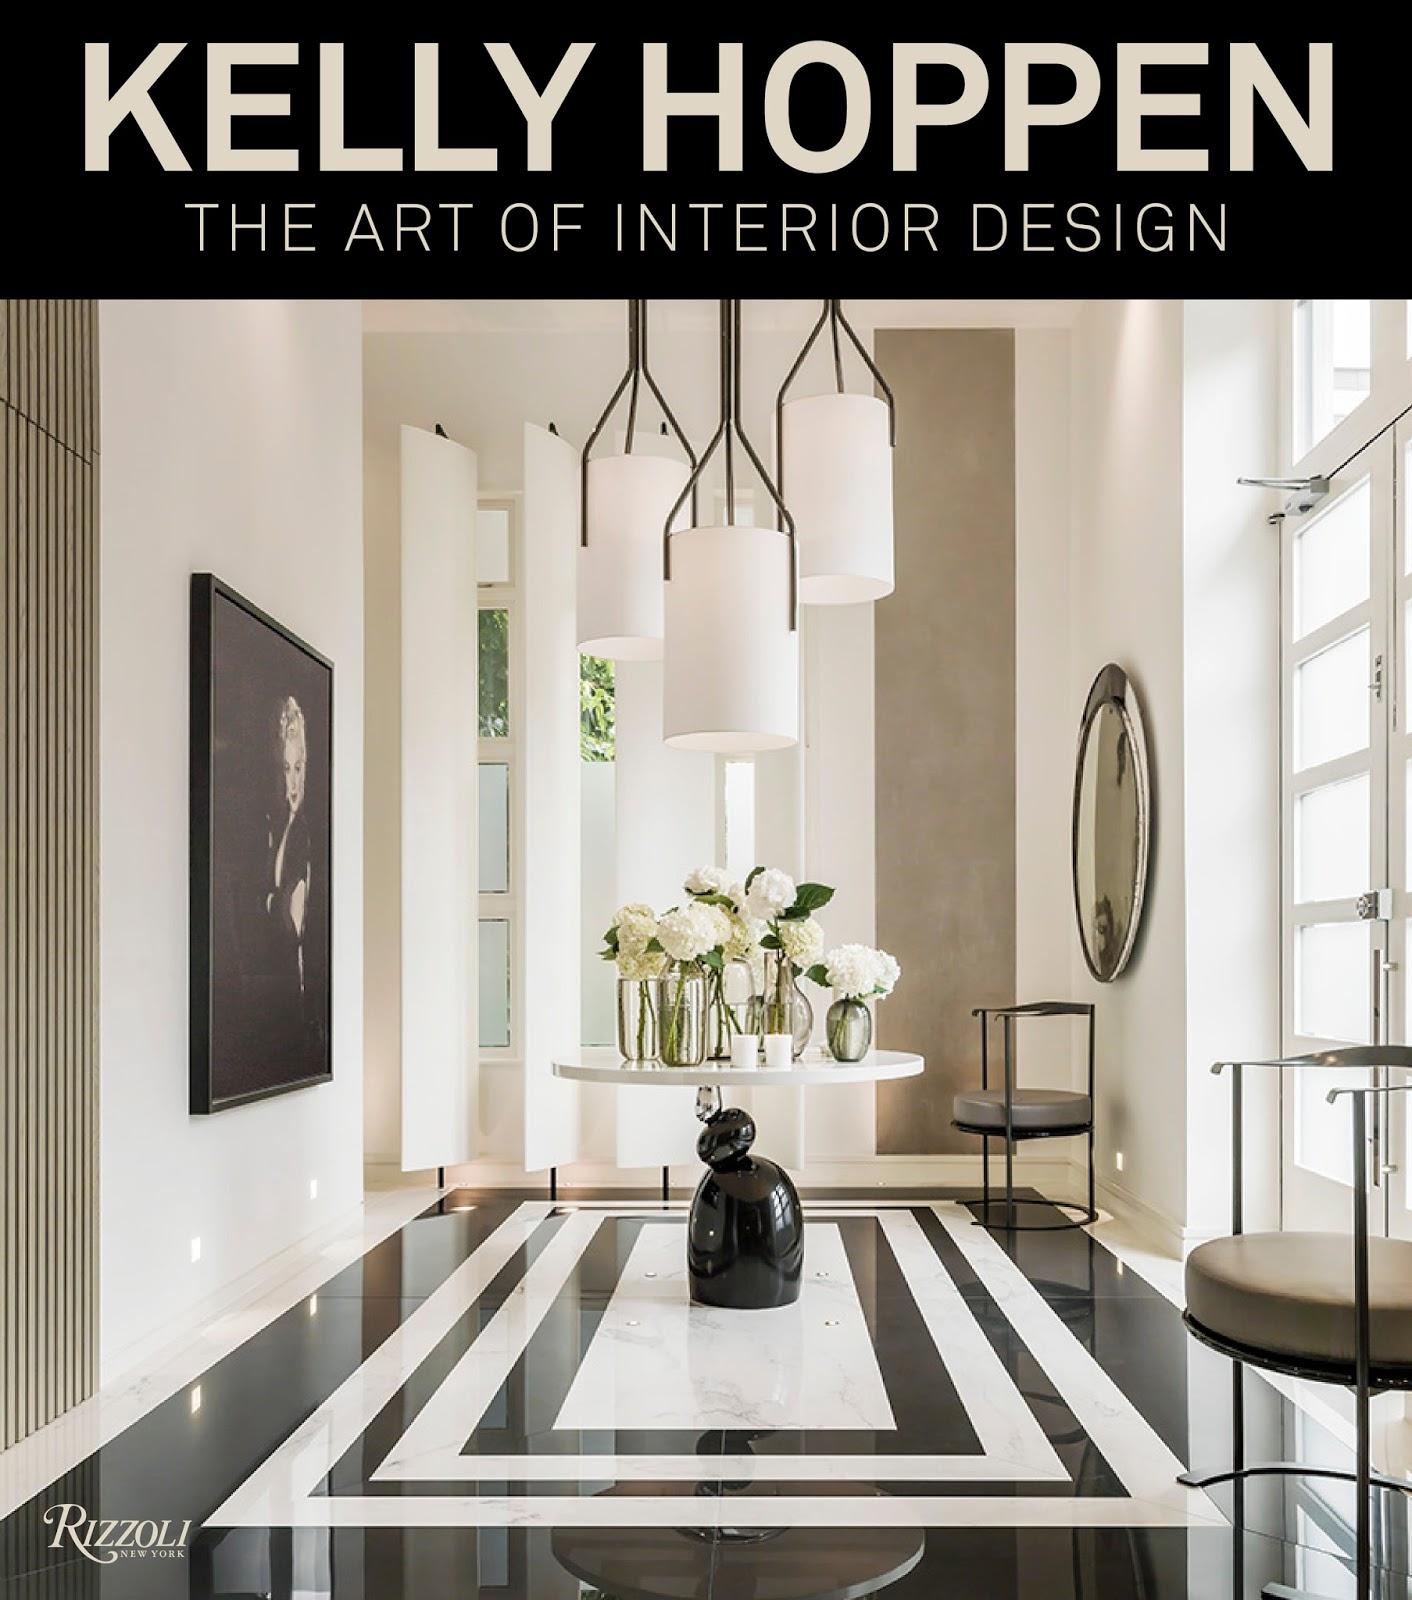 Splendid Sass: BOOK REVIEW: KELLY HOPPEN: THE ART OF